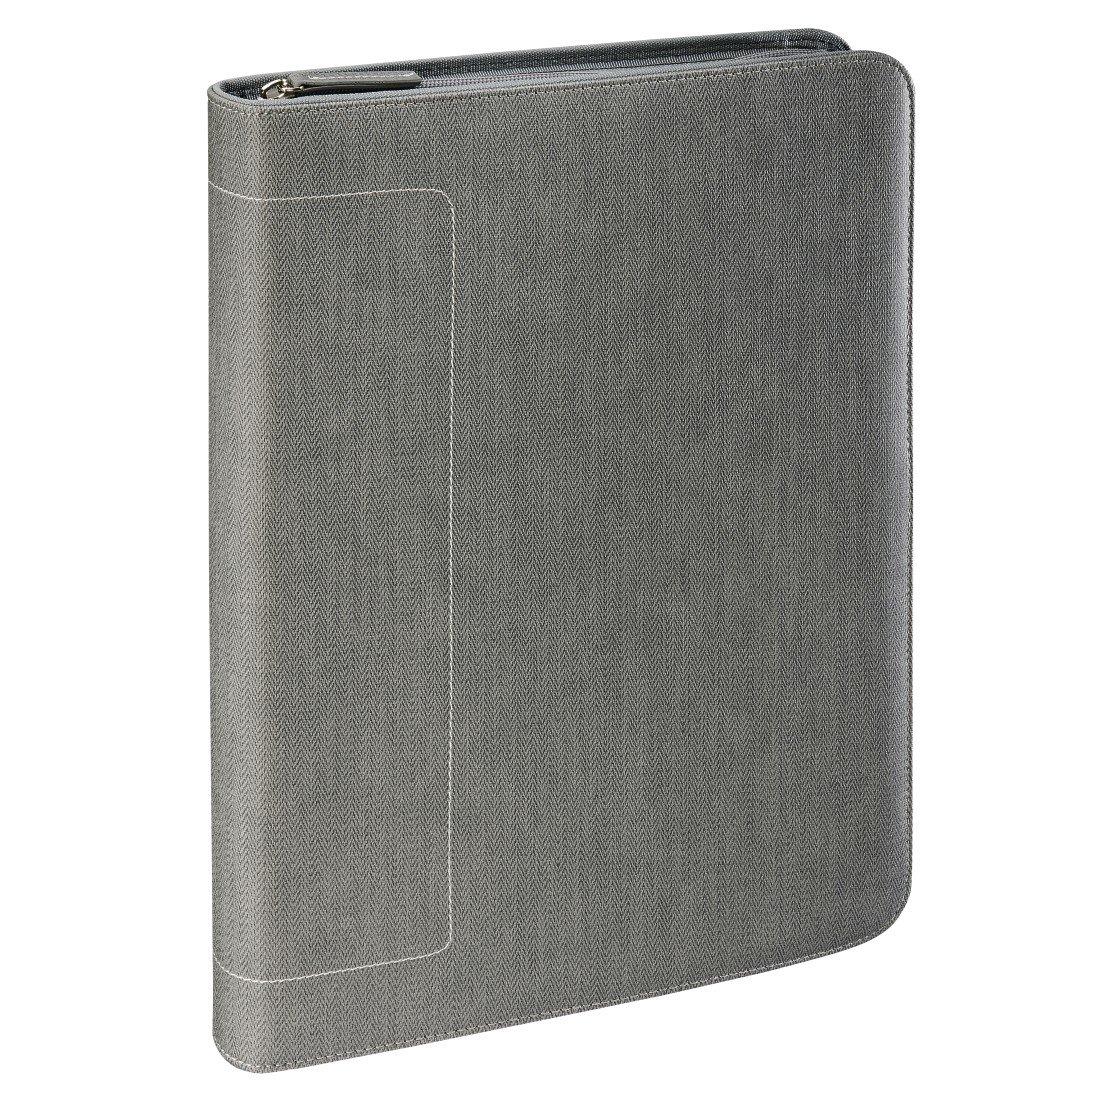 Hama Tablet Organizer A4 Hannover Light Grey 00138664